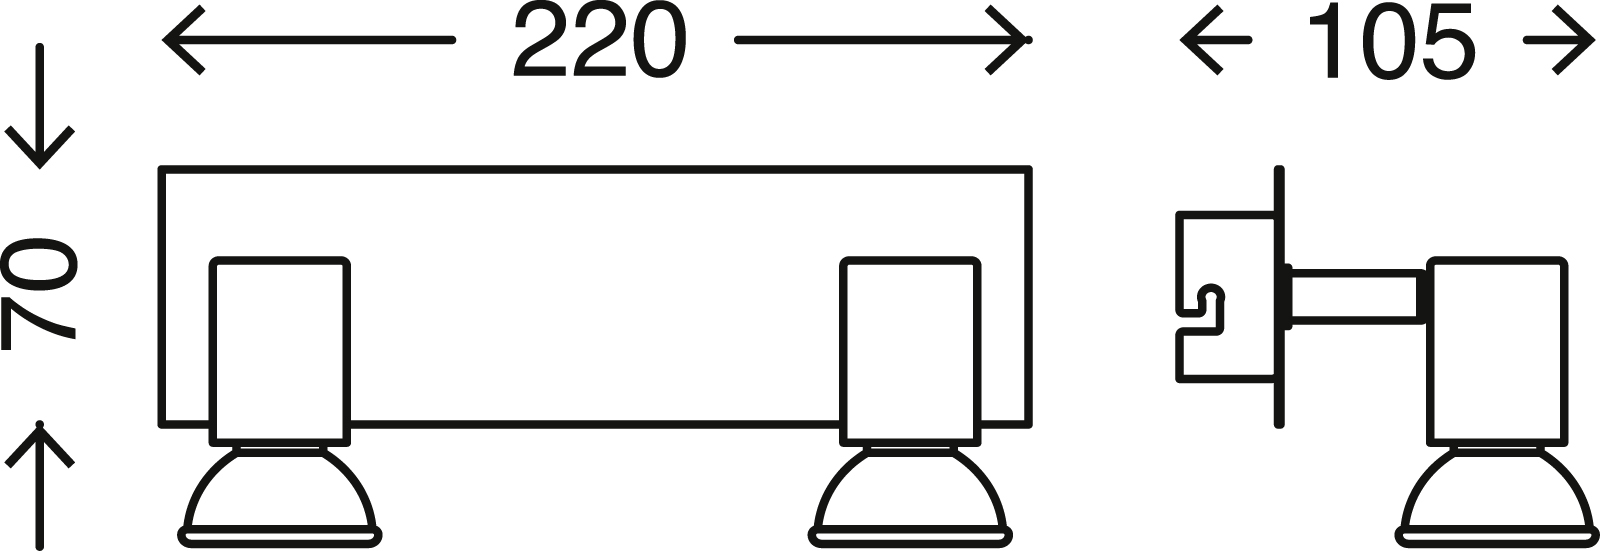 LED Spot Deckenleuchte, 22 cm, 8 W, Chrom